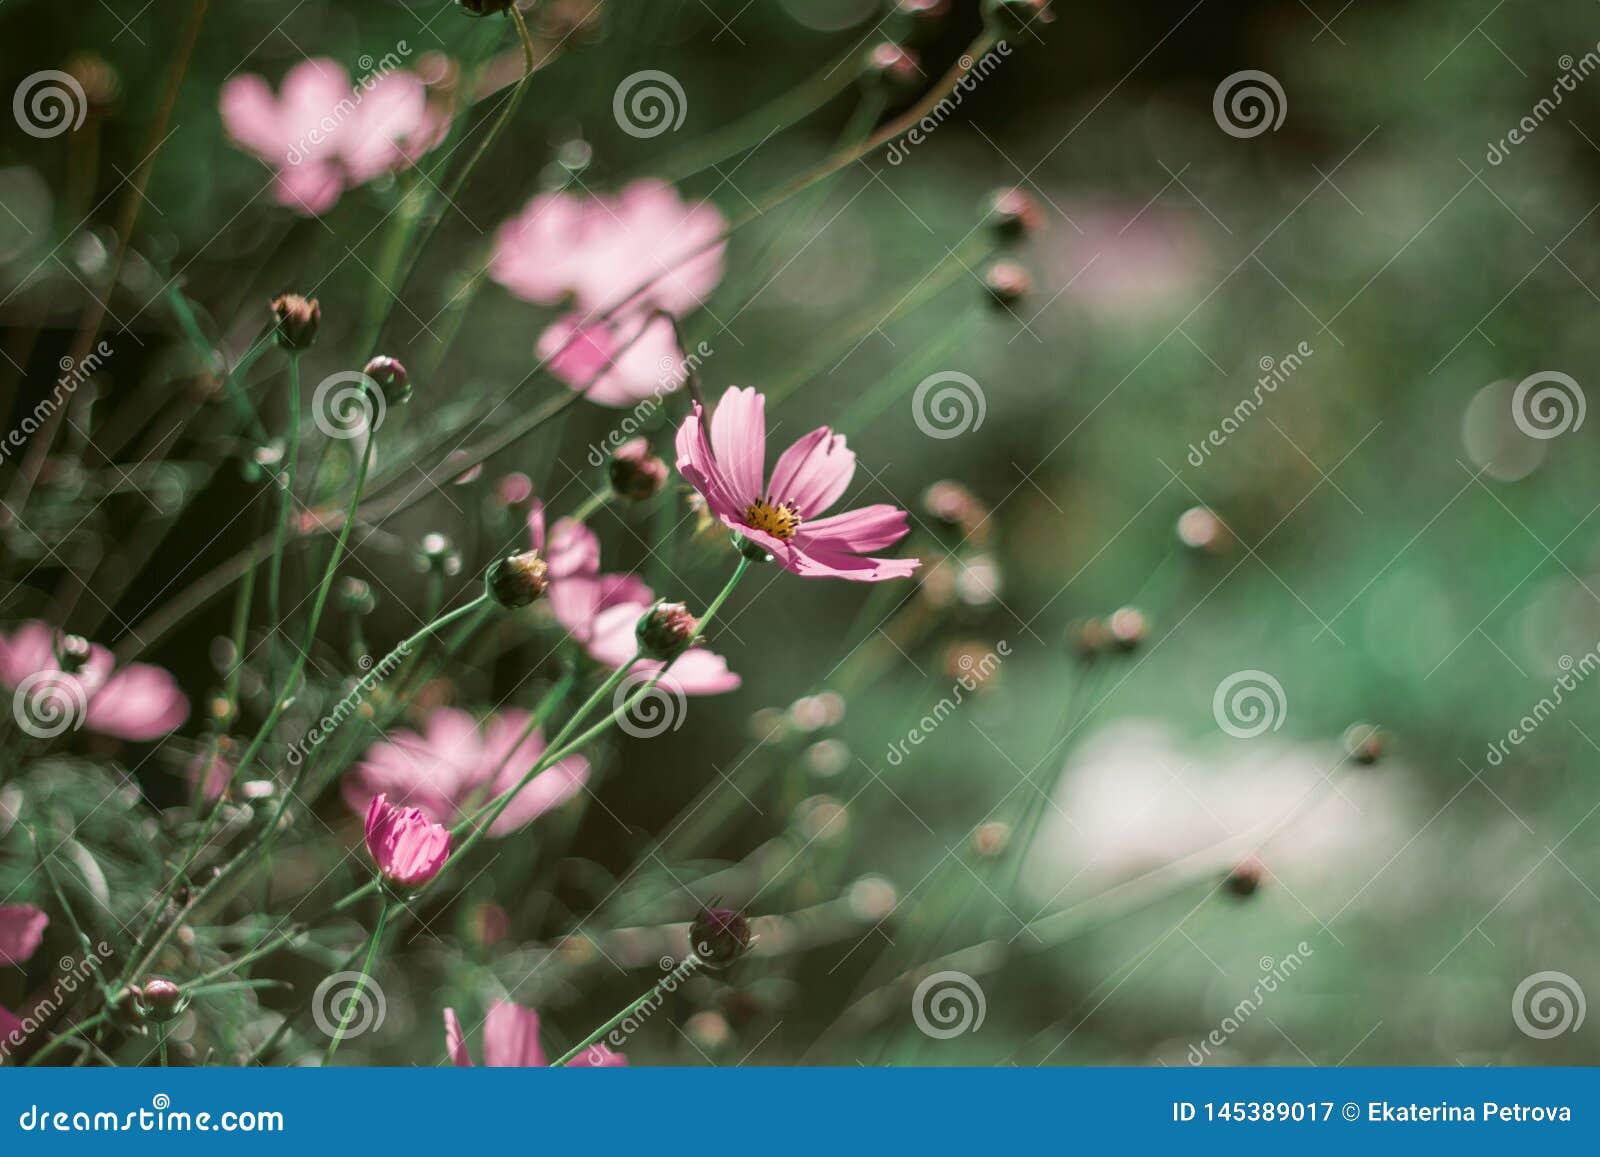 Delikata rosa tusensk